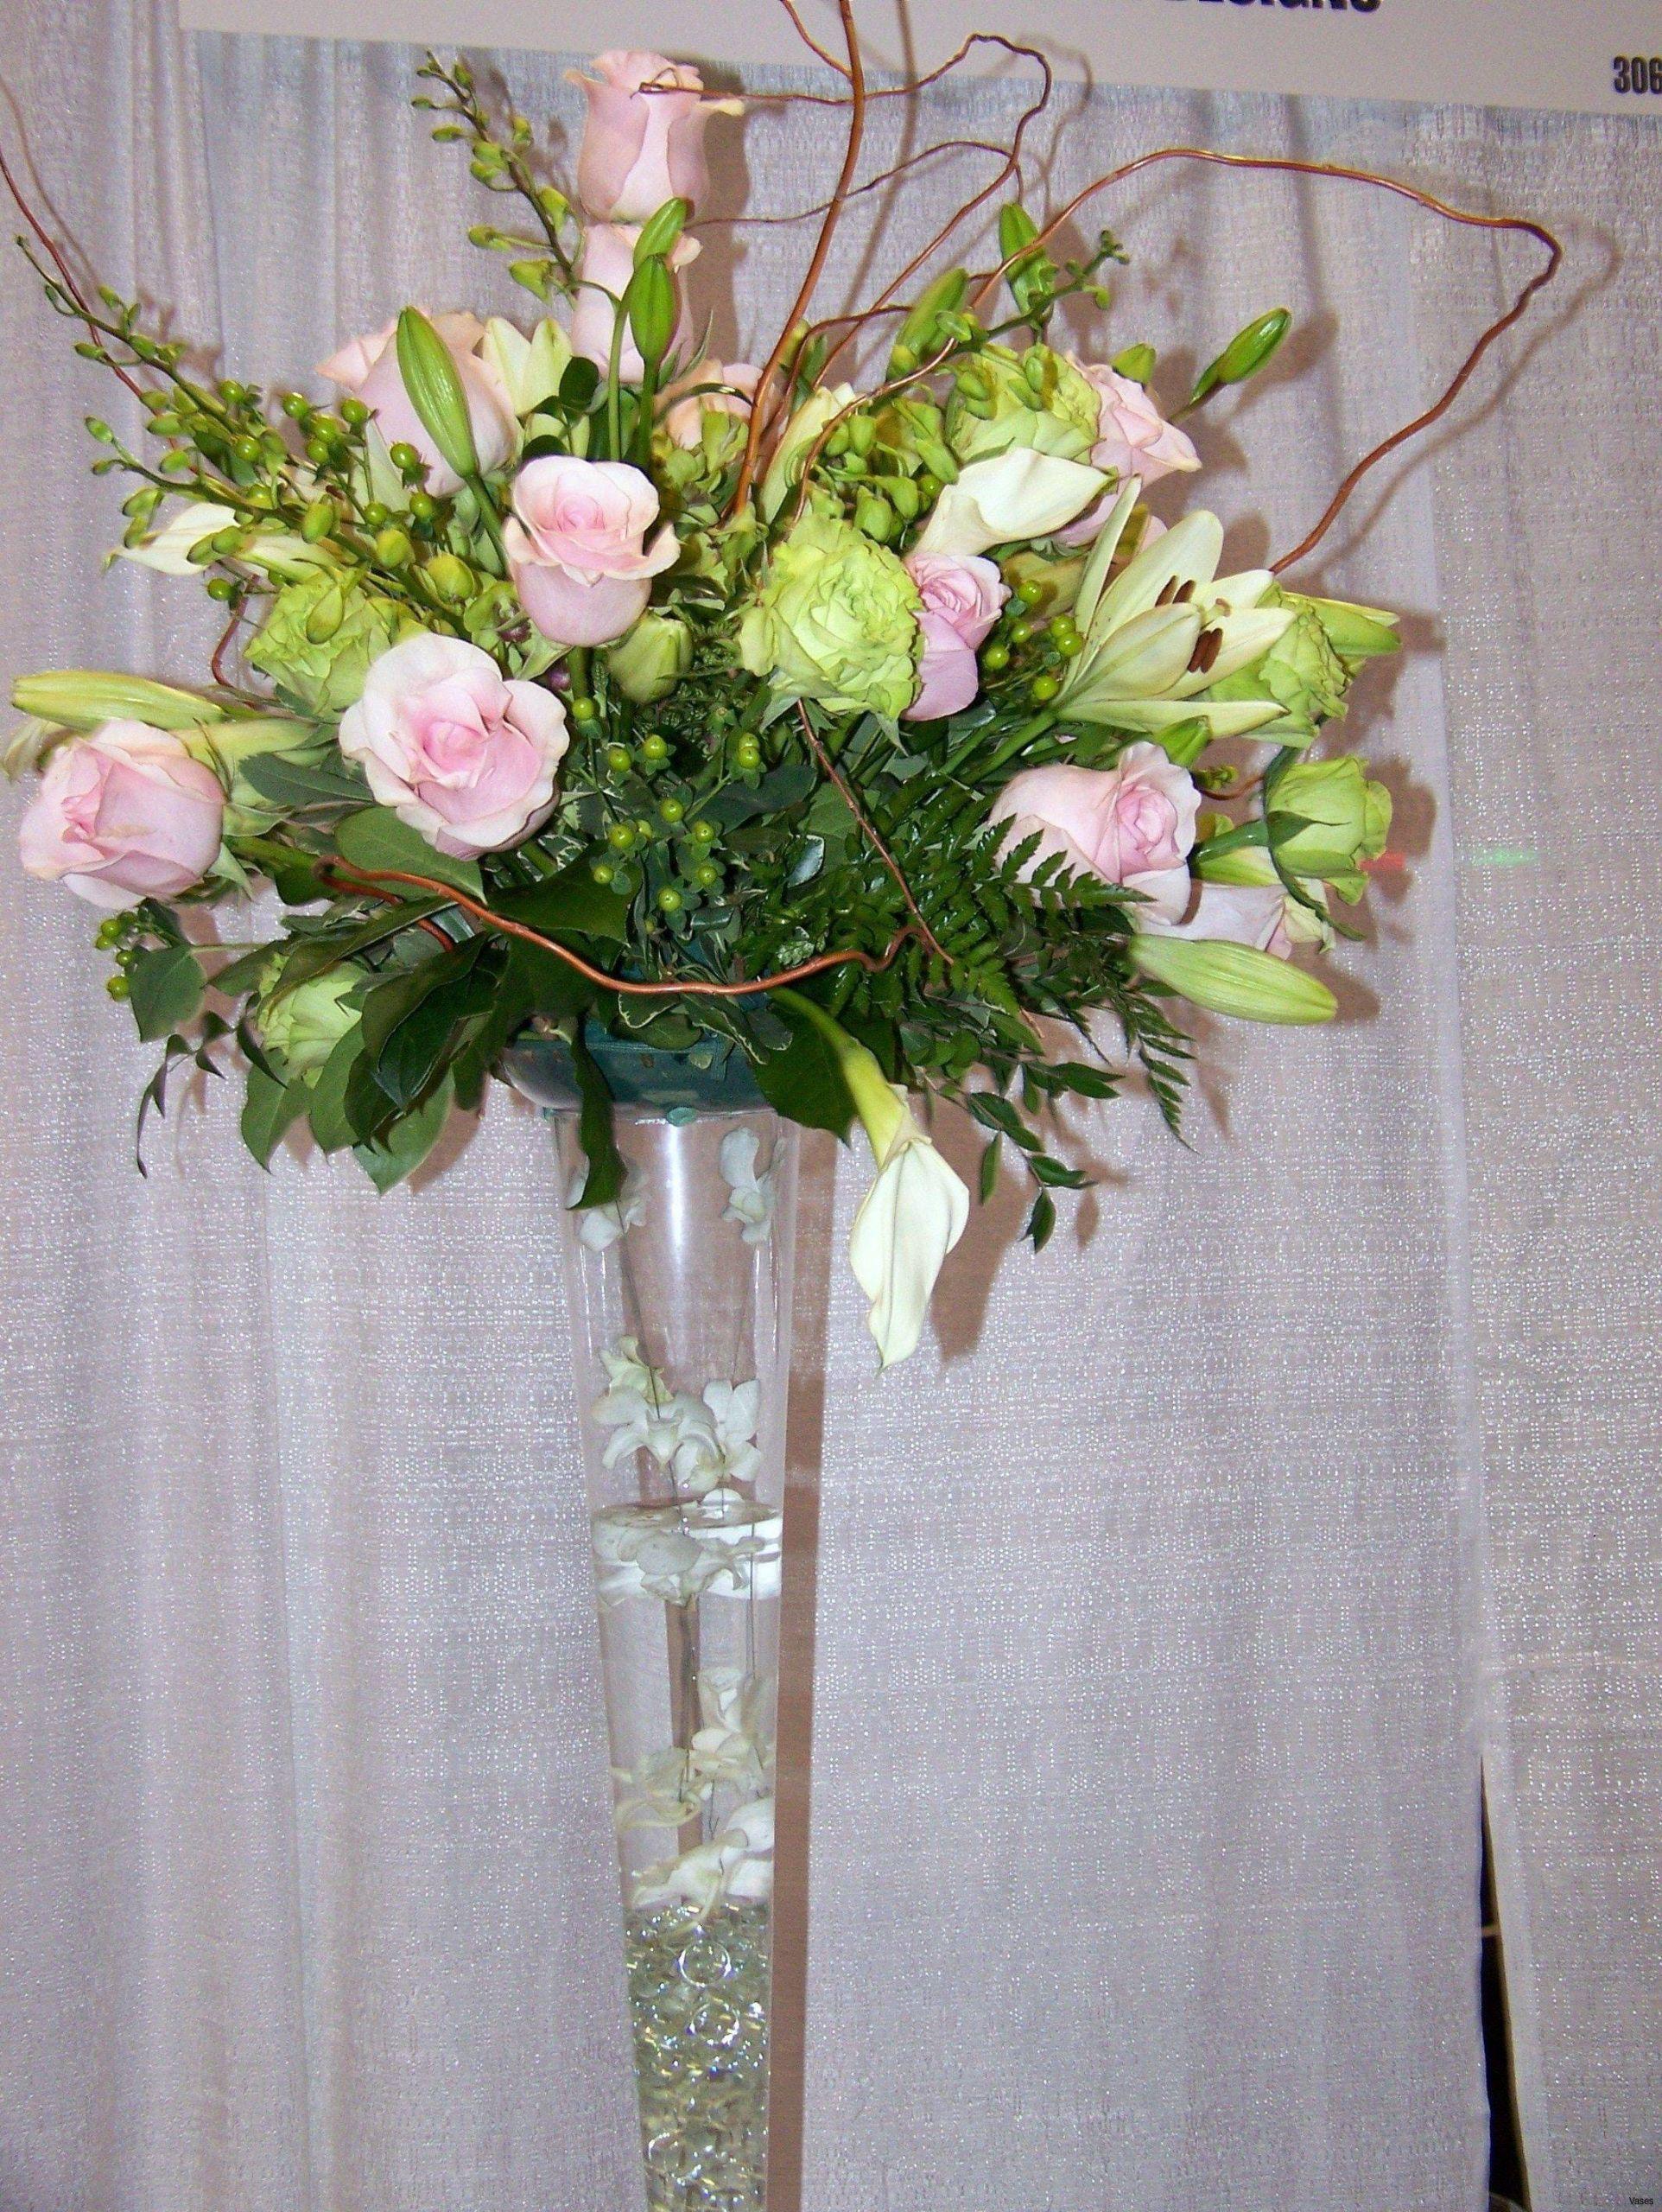 large glass flower vase of 22 hobnail glass vase the weekly world throughout h vases ideas for floral arrangements in i 0d design ideas design